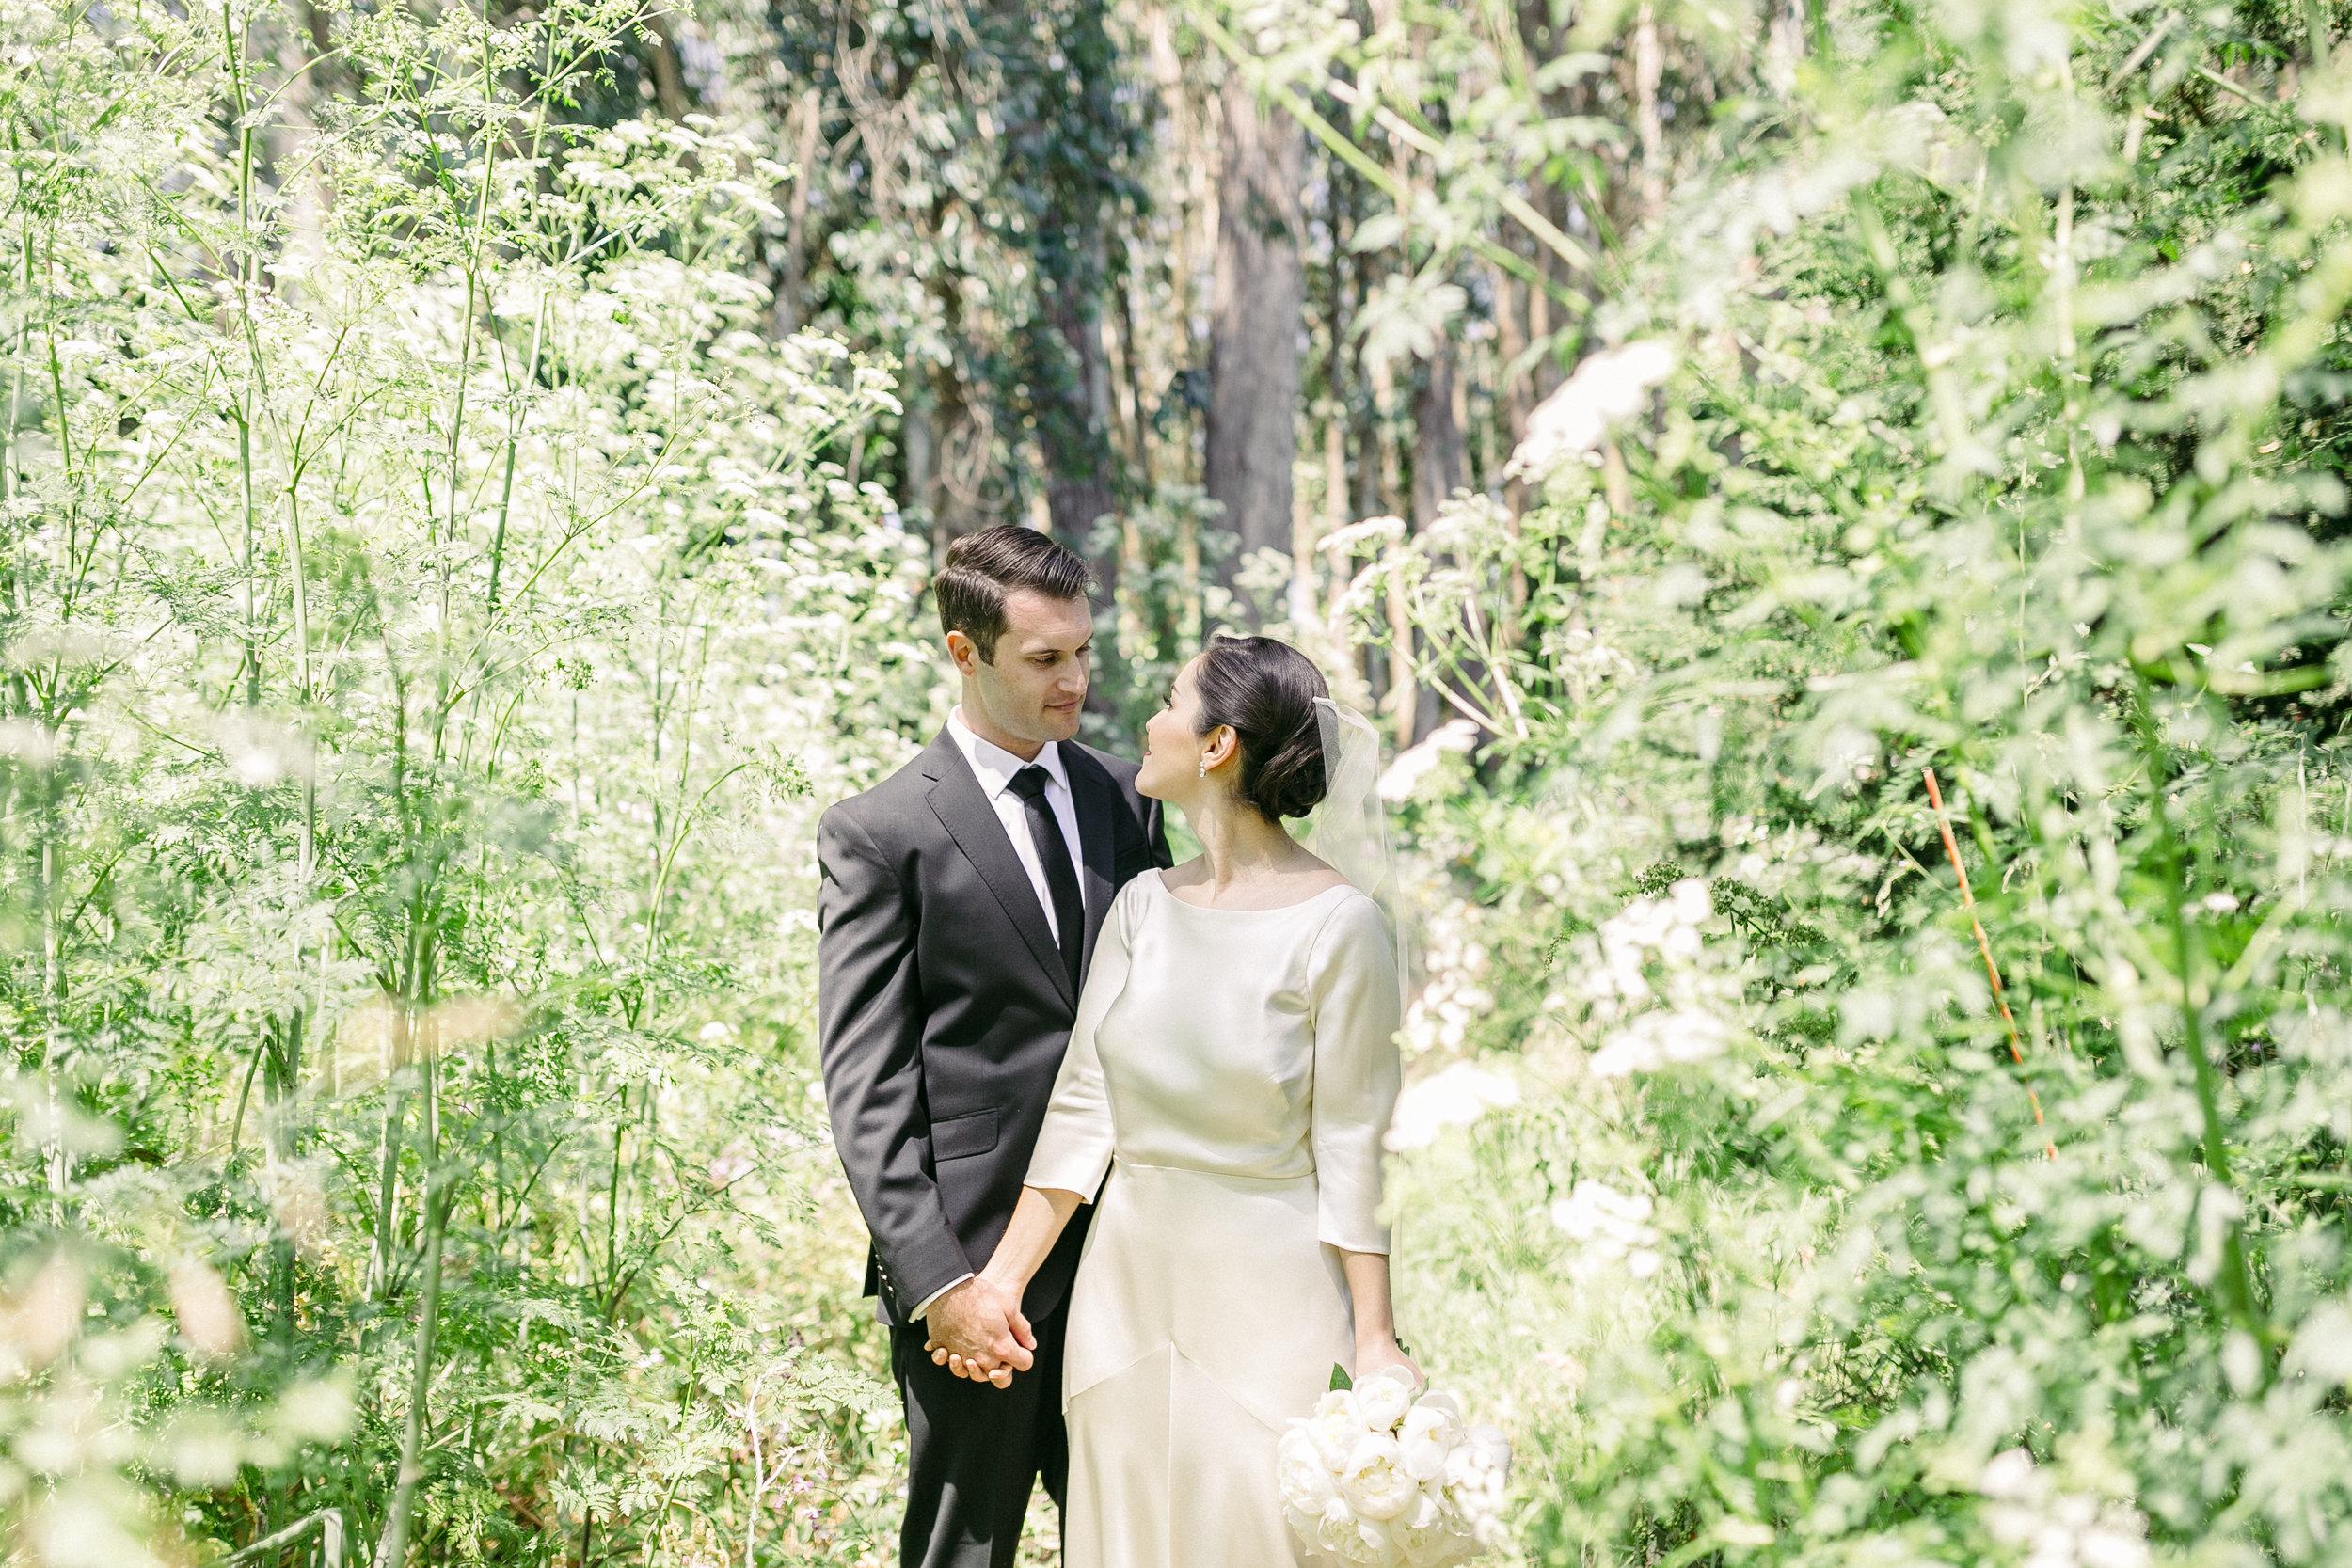 Agnus-Christopher-Wedding-0414-BX8A0582.jpg